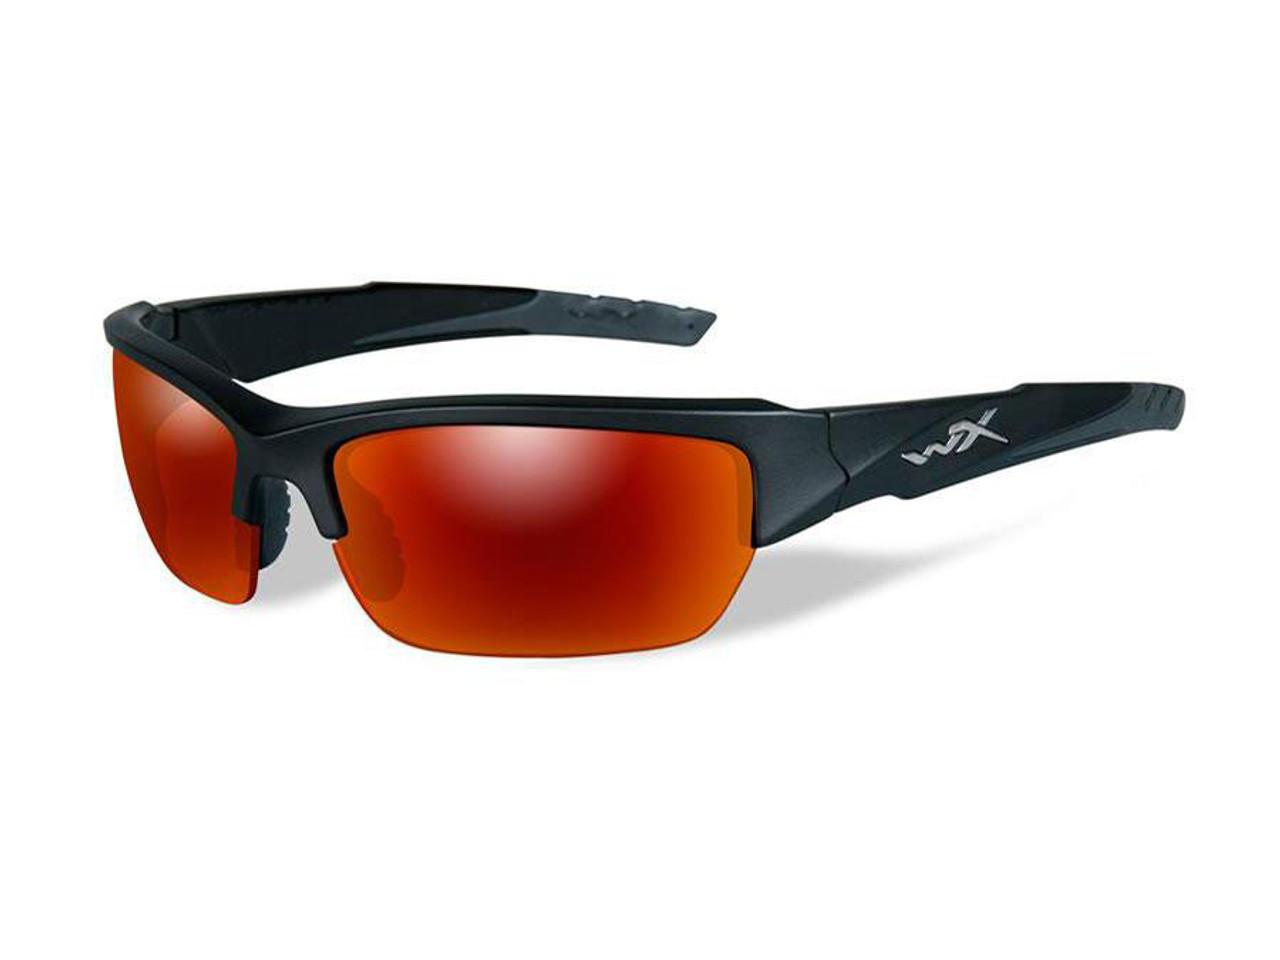 79d5bcf4c1c59 Wiley X WX Valor Polarized Changeable Sunglasses (Color  Polarized Crimson  Mirror lens with Matte